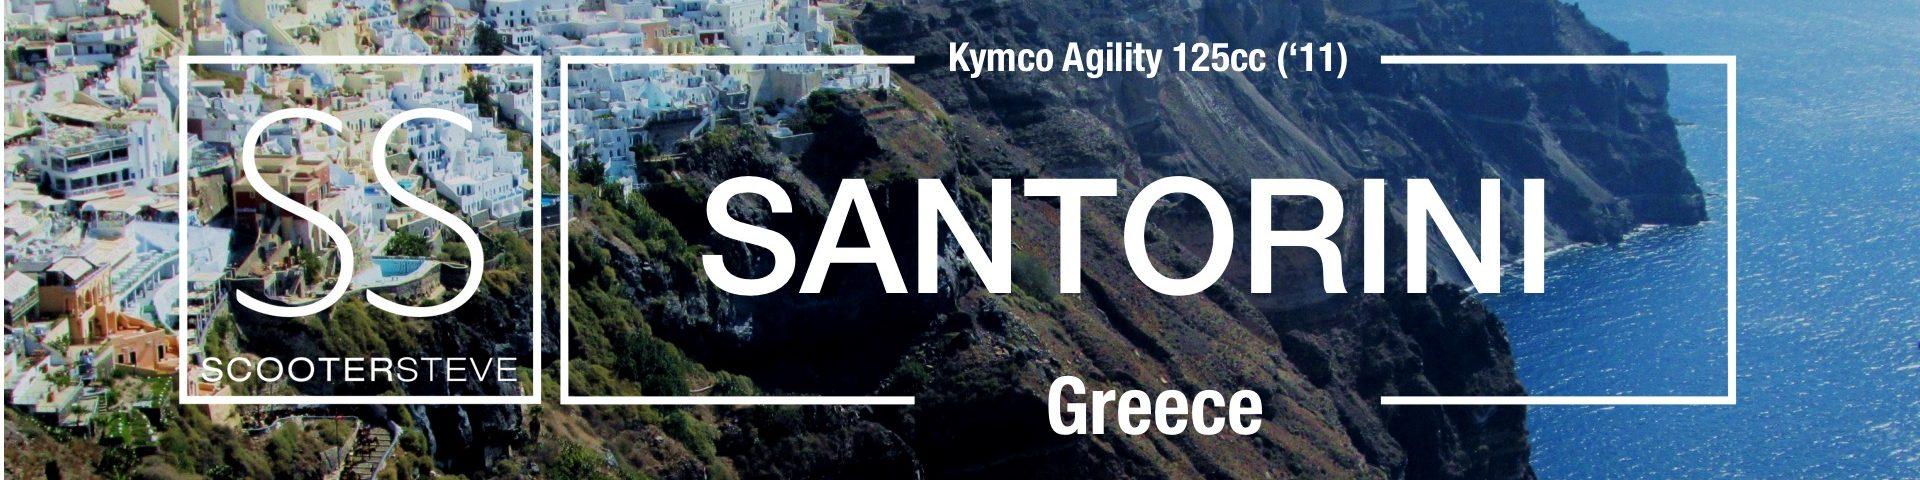 Santorini Header Large